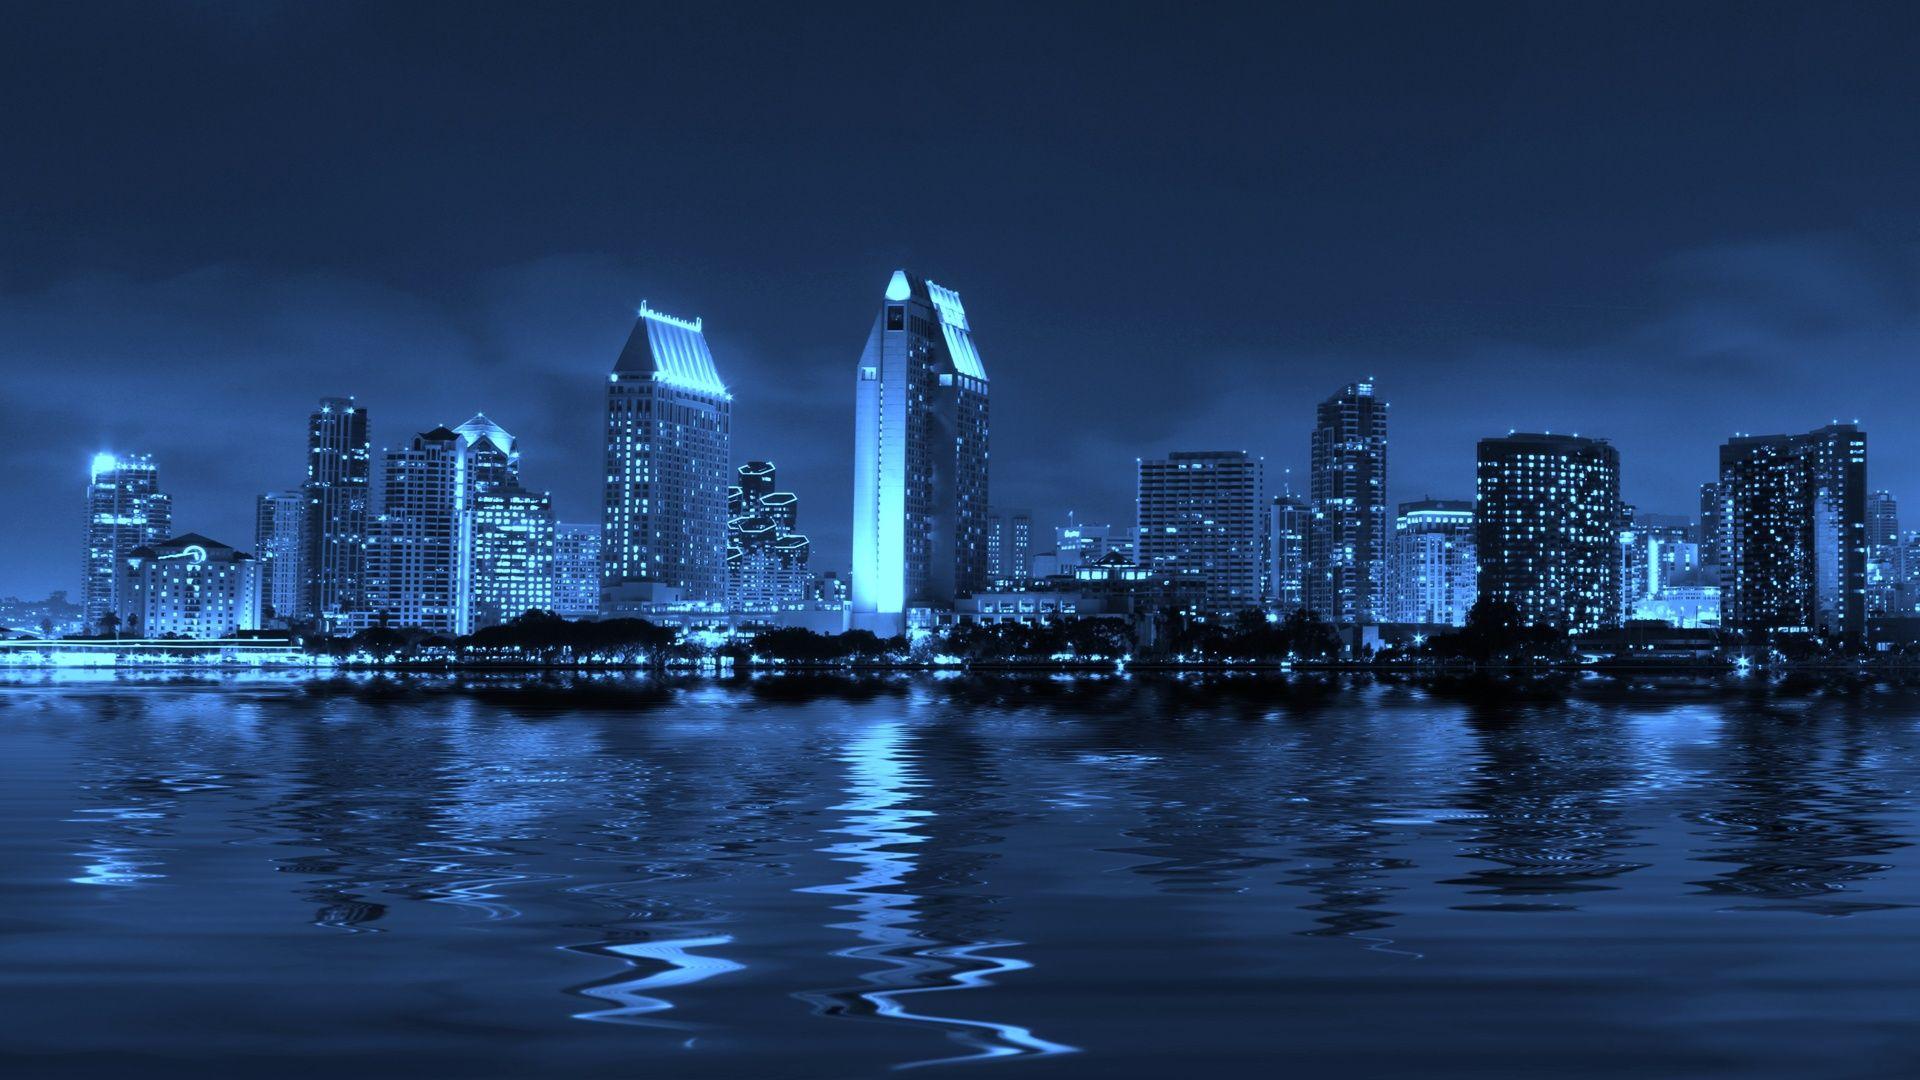 San Diego Blue Night Building Light Chile Wallpaper San